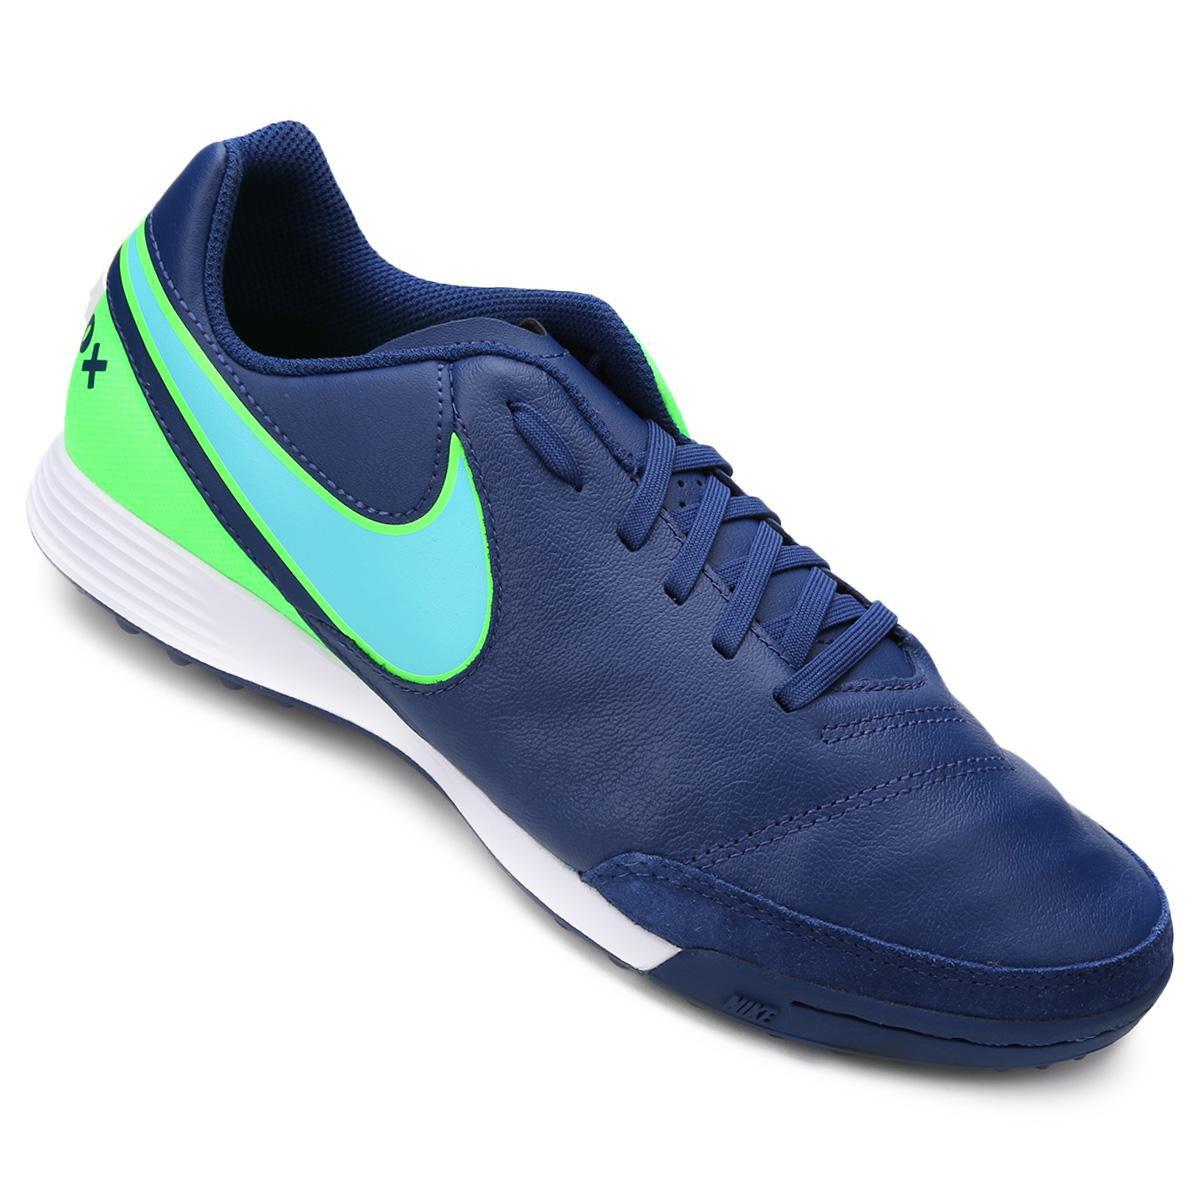 611998a5353a2 Chuteira Society Nike Tiempo Genio 2 Leather TF - Compre Agora ...